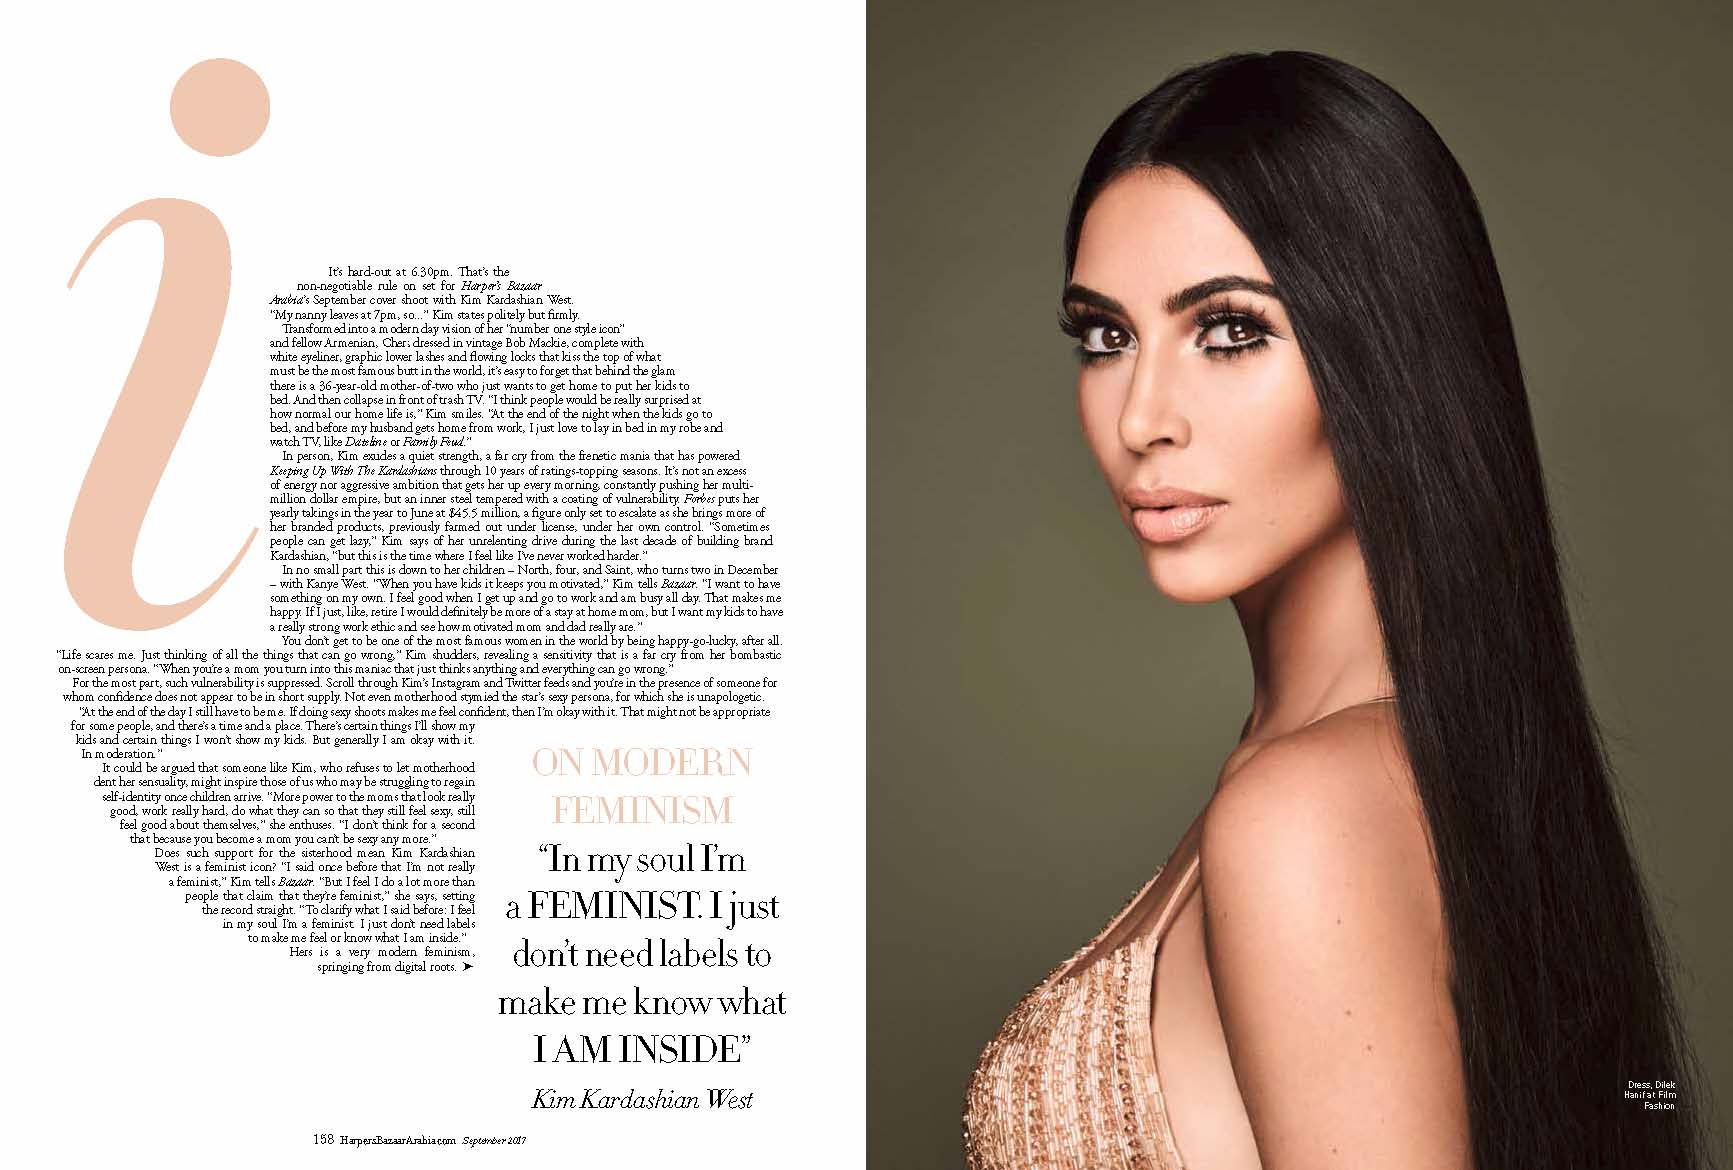 Kim Kardashian West, September 2017 2.jpg